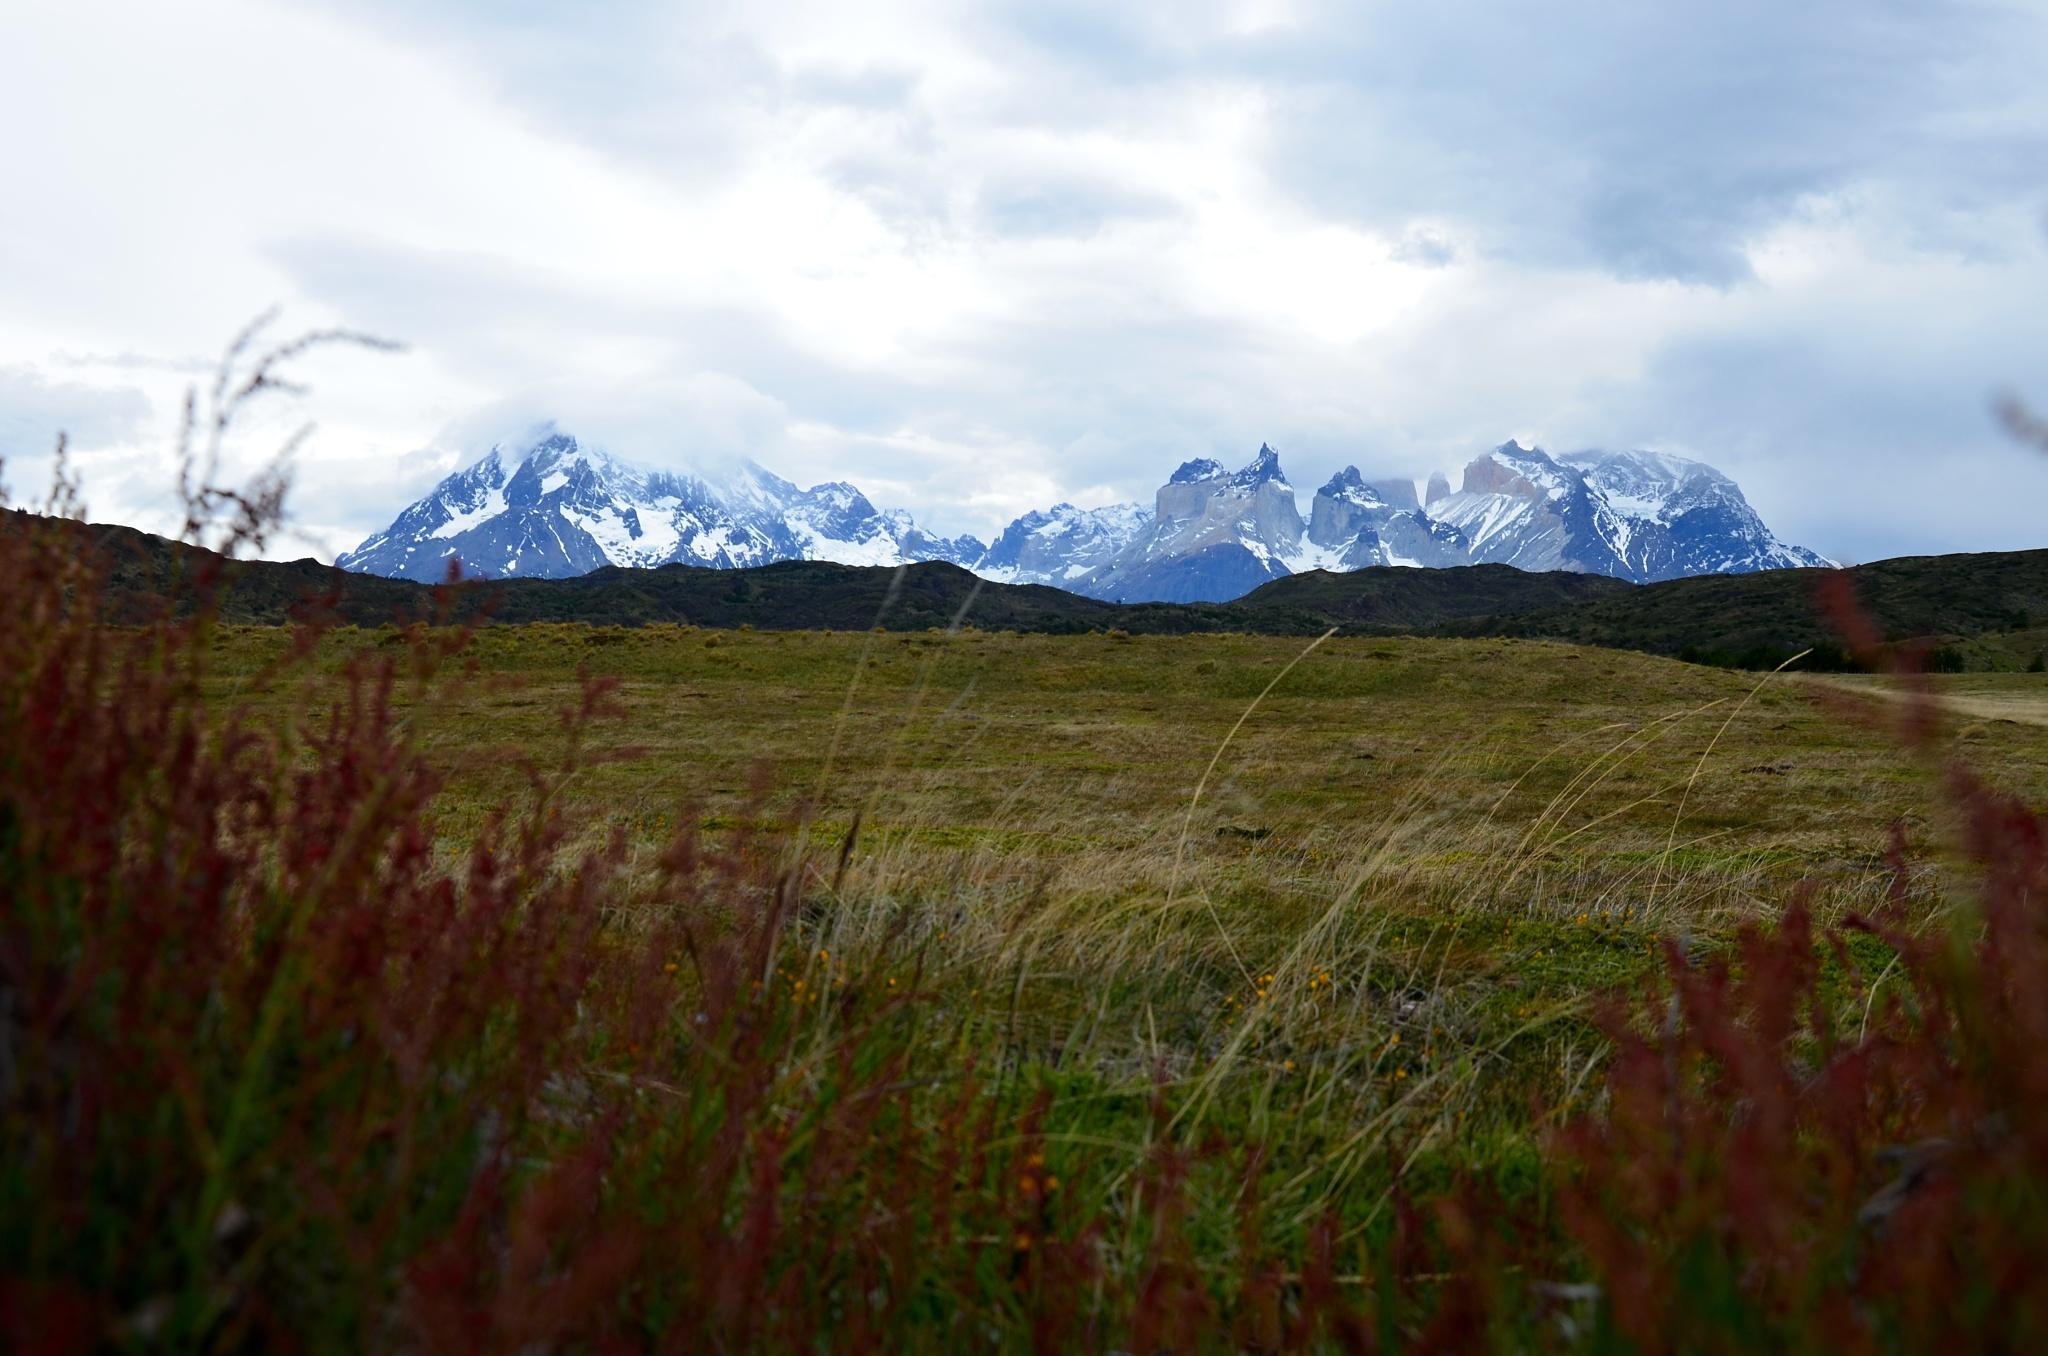 Pampa a v pozadí Paine Grande a Cuernos del Paine